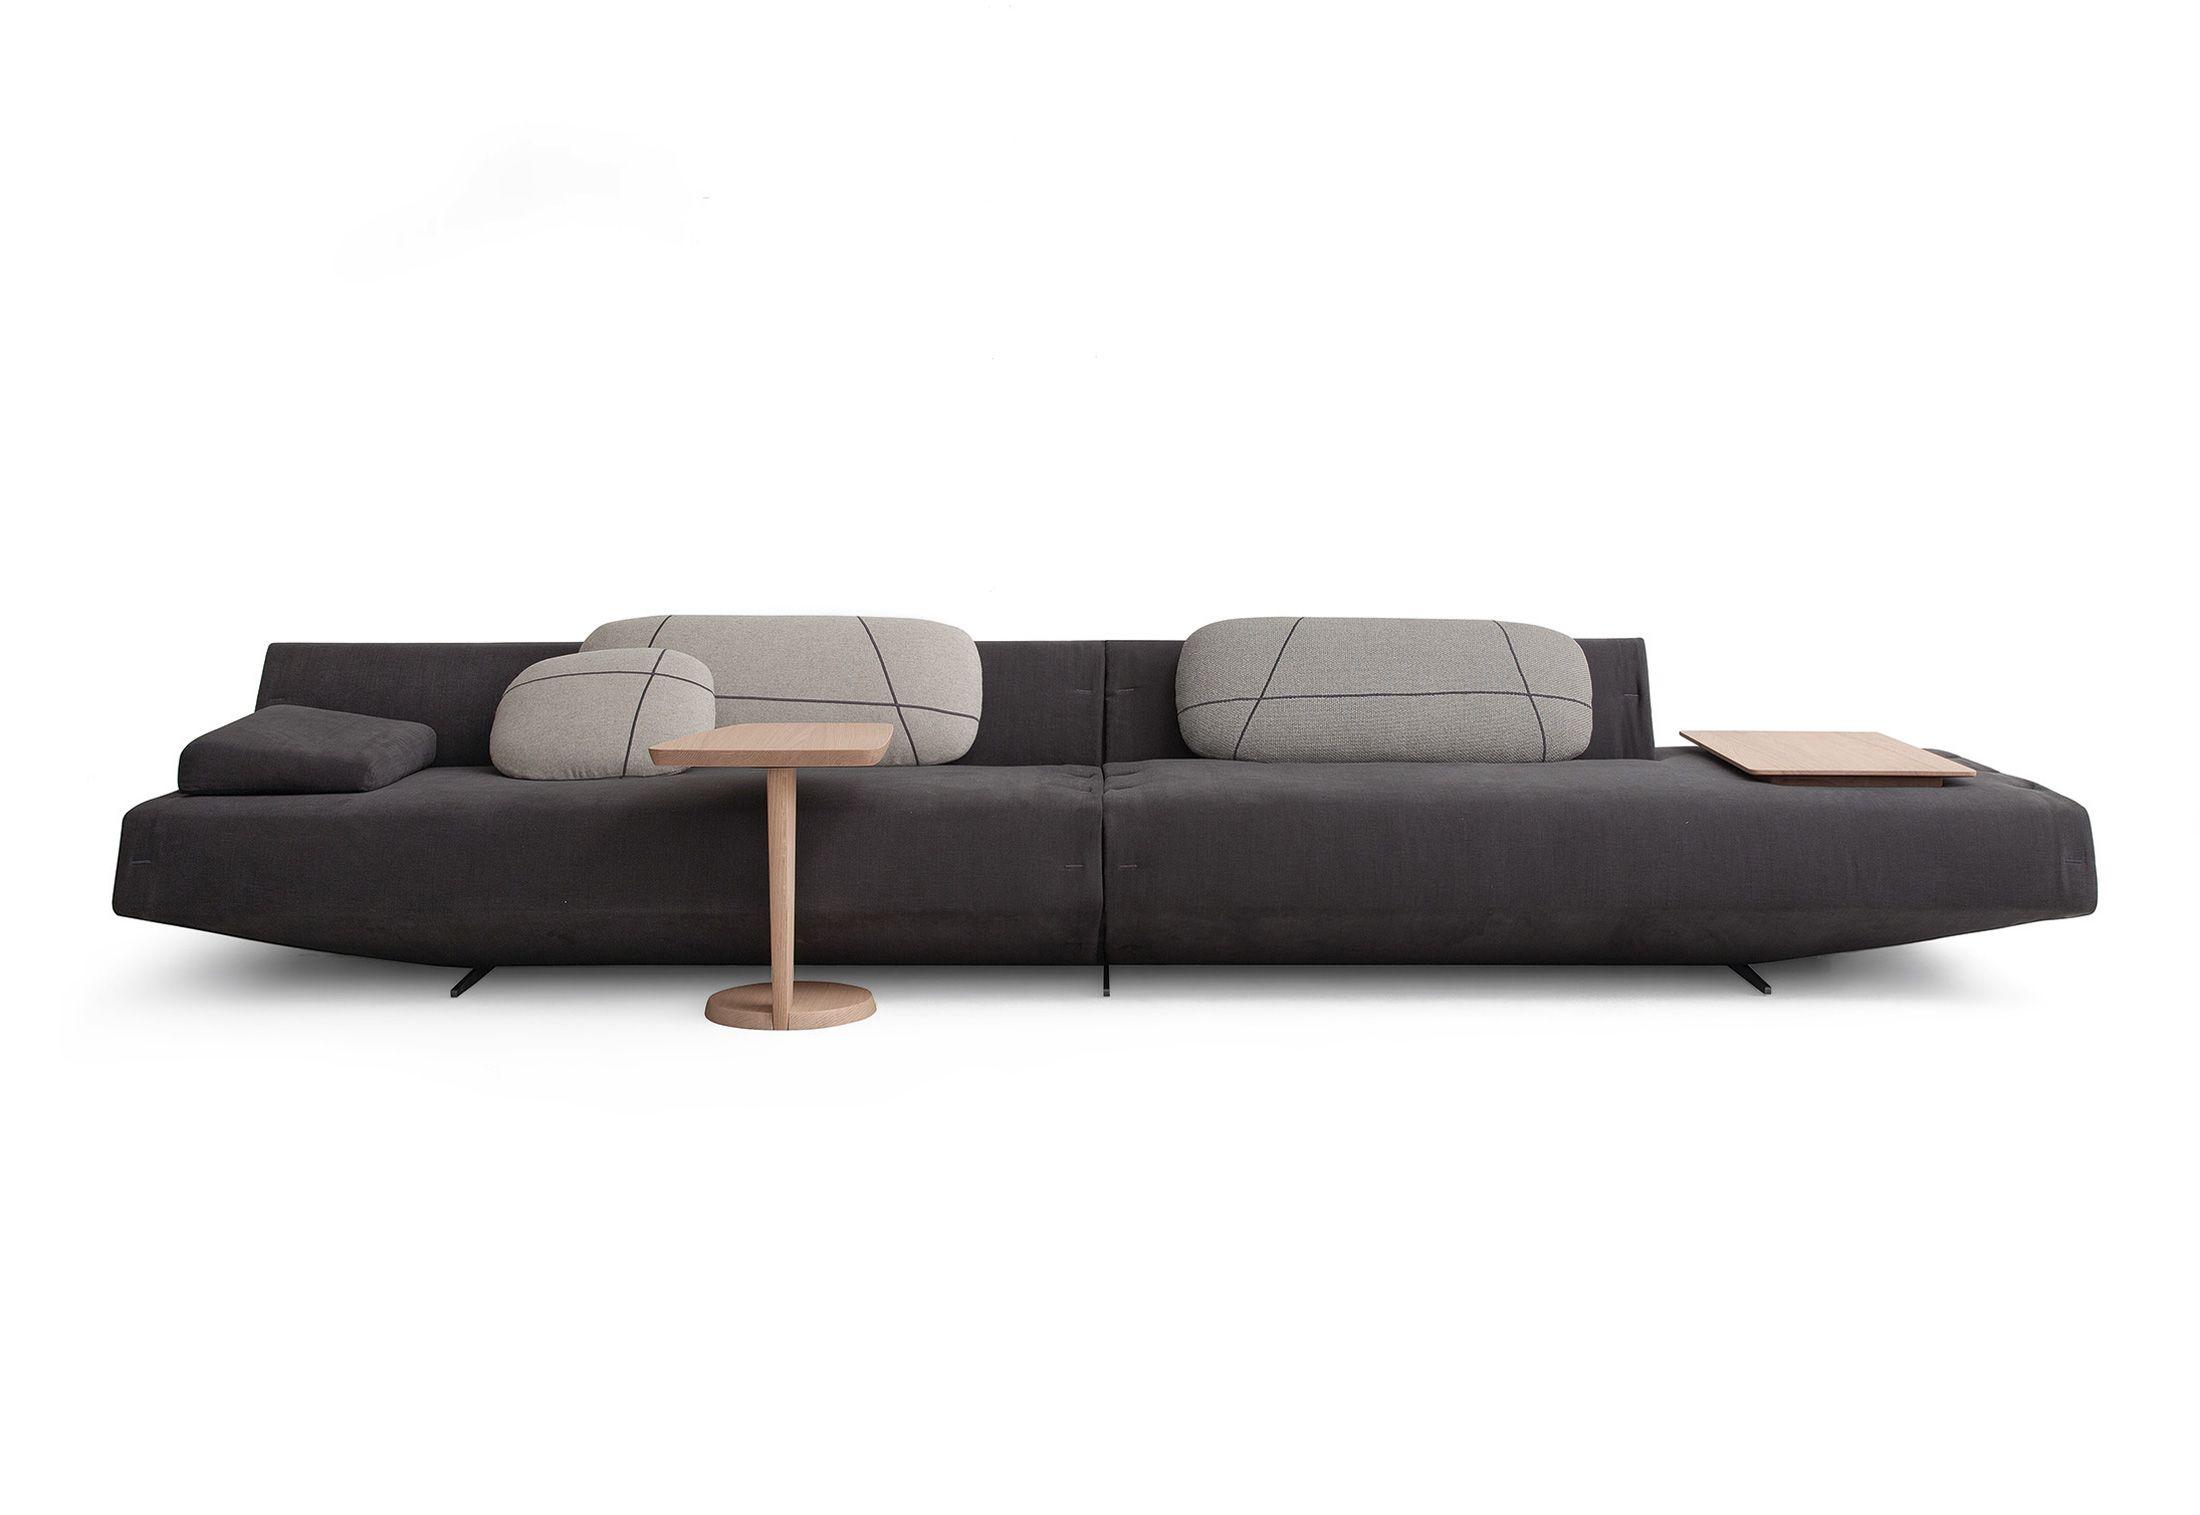 Poliform Sydney sofa Jean-Marie Massaud   Furniture   Pinterest ...